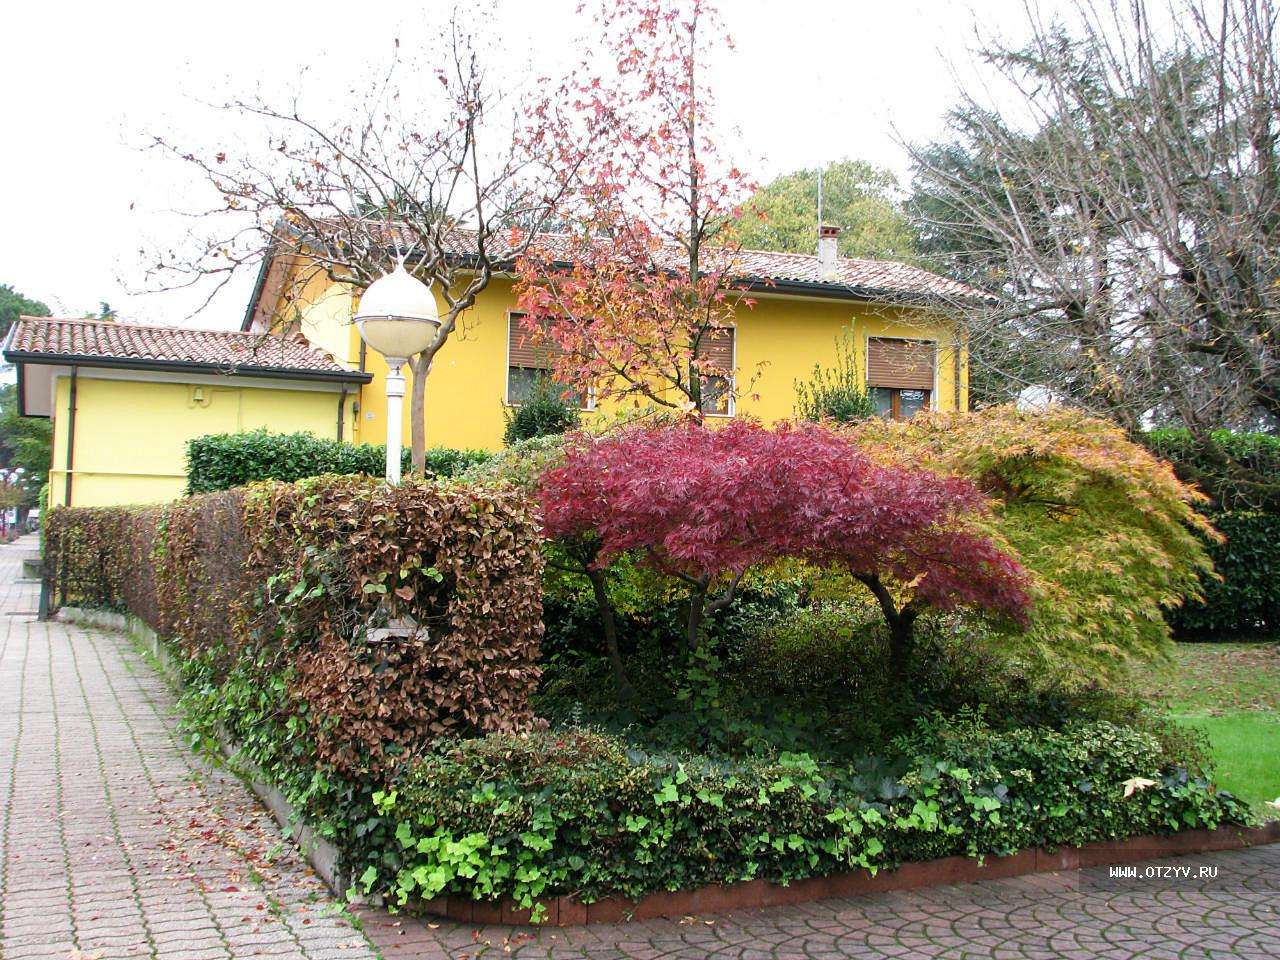 Nuove case a Montegrotto Terme